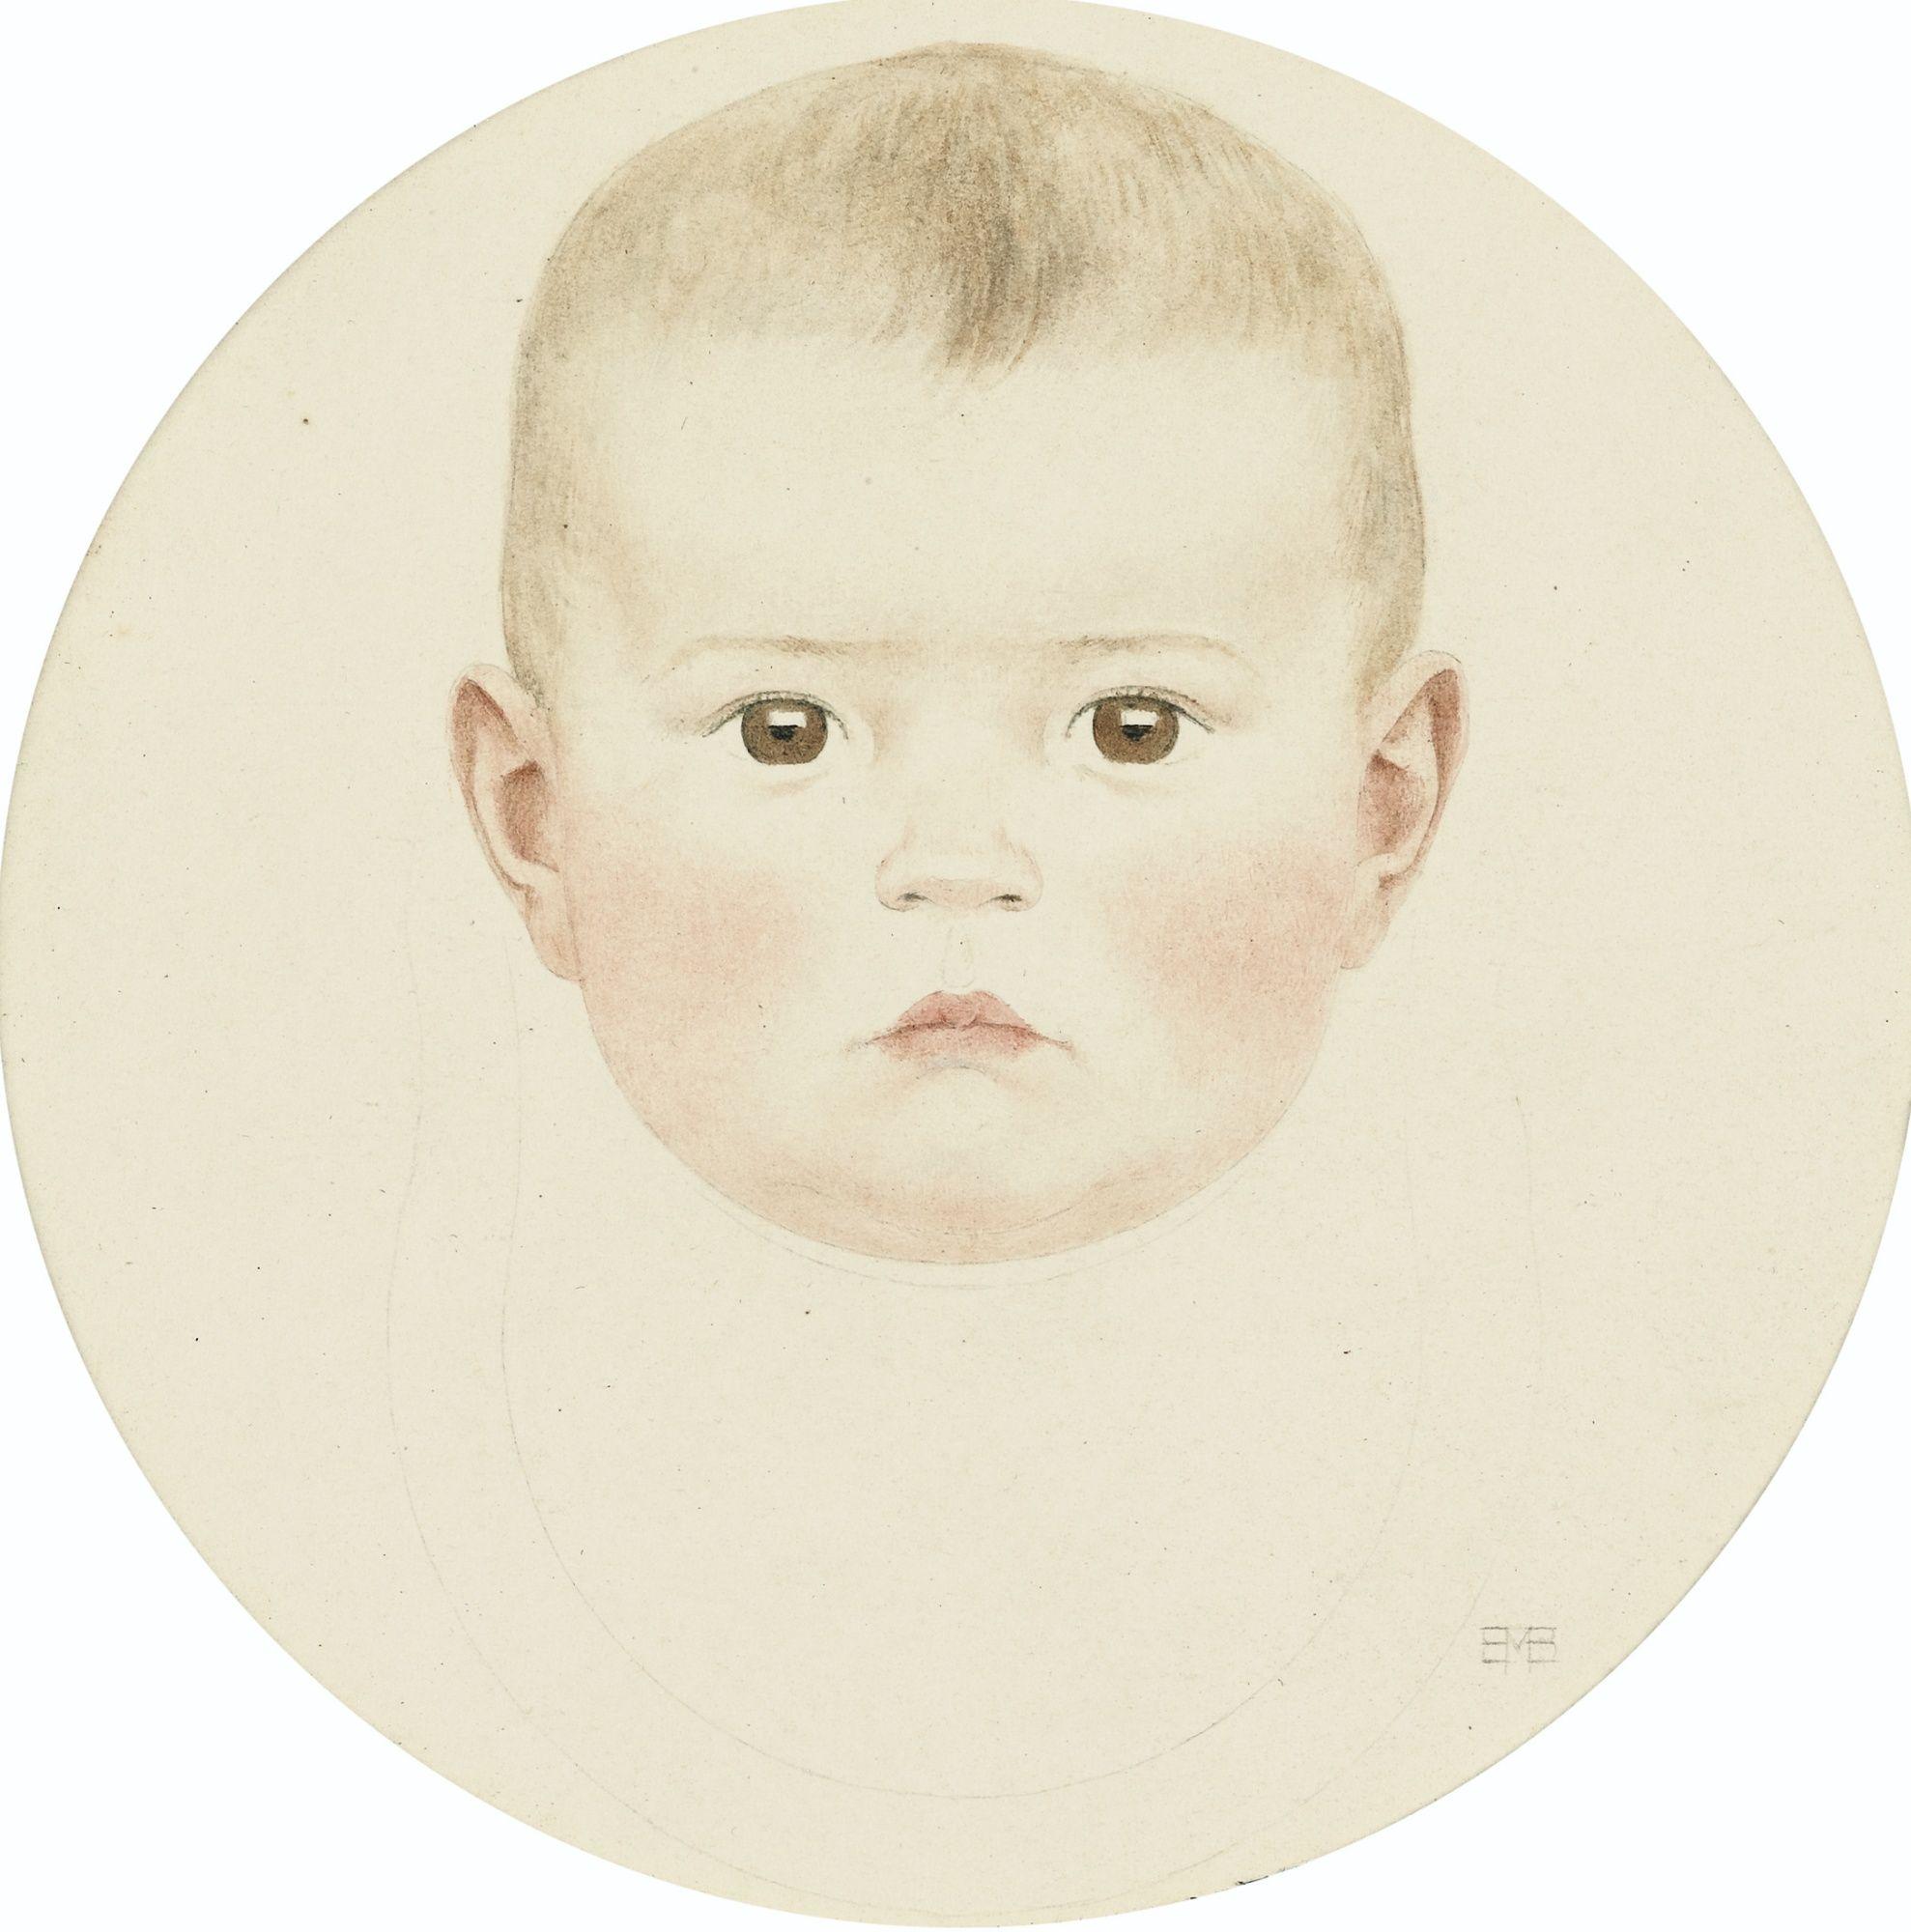 SYLVIE BÉBÉ by Bernard Boutet de Monvel (French 1881-1949) ; SYLVIE AS A BABY ; WATERCOLOR ON PAPER